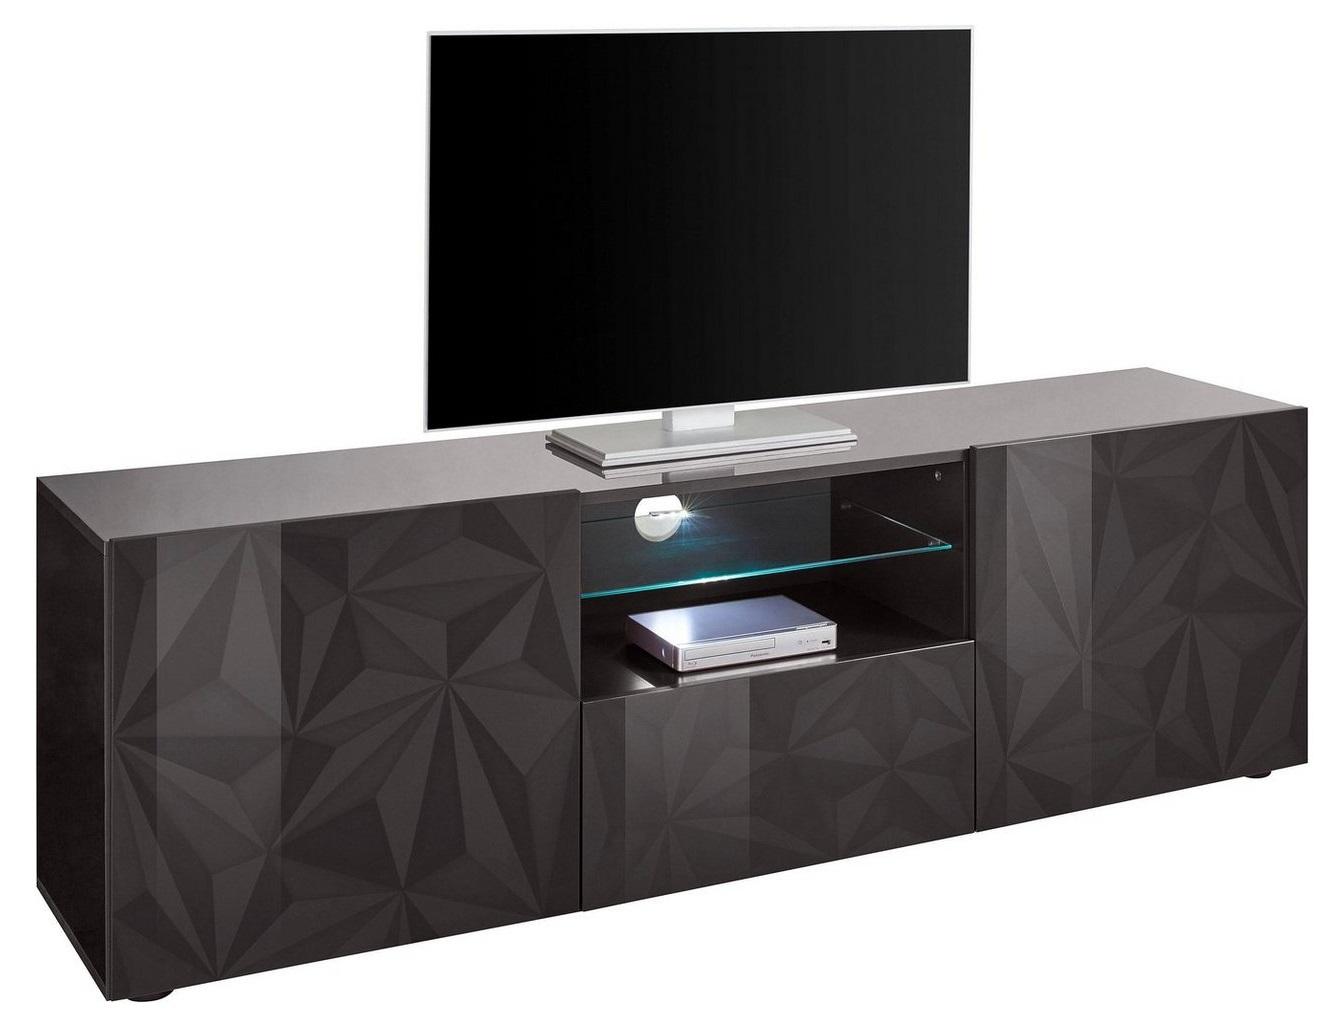 Tv-meubel Kristal 181 cm breed in hoogglans antraciet   Pesaro Mobilia